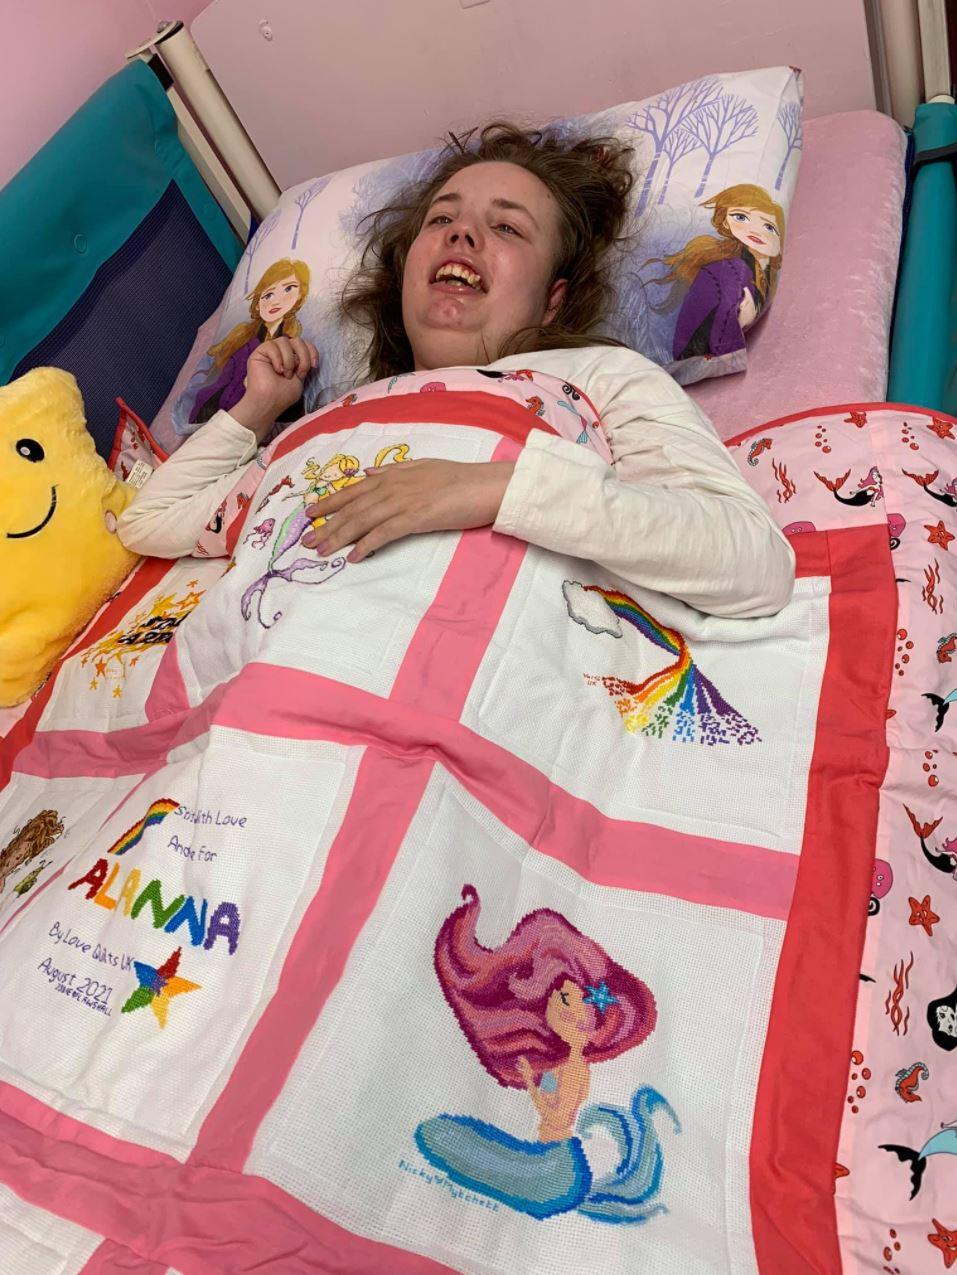 Photo of Alanna B's quilt